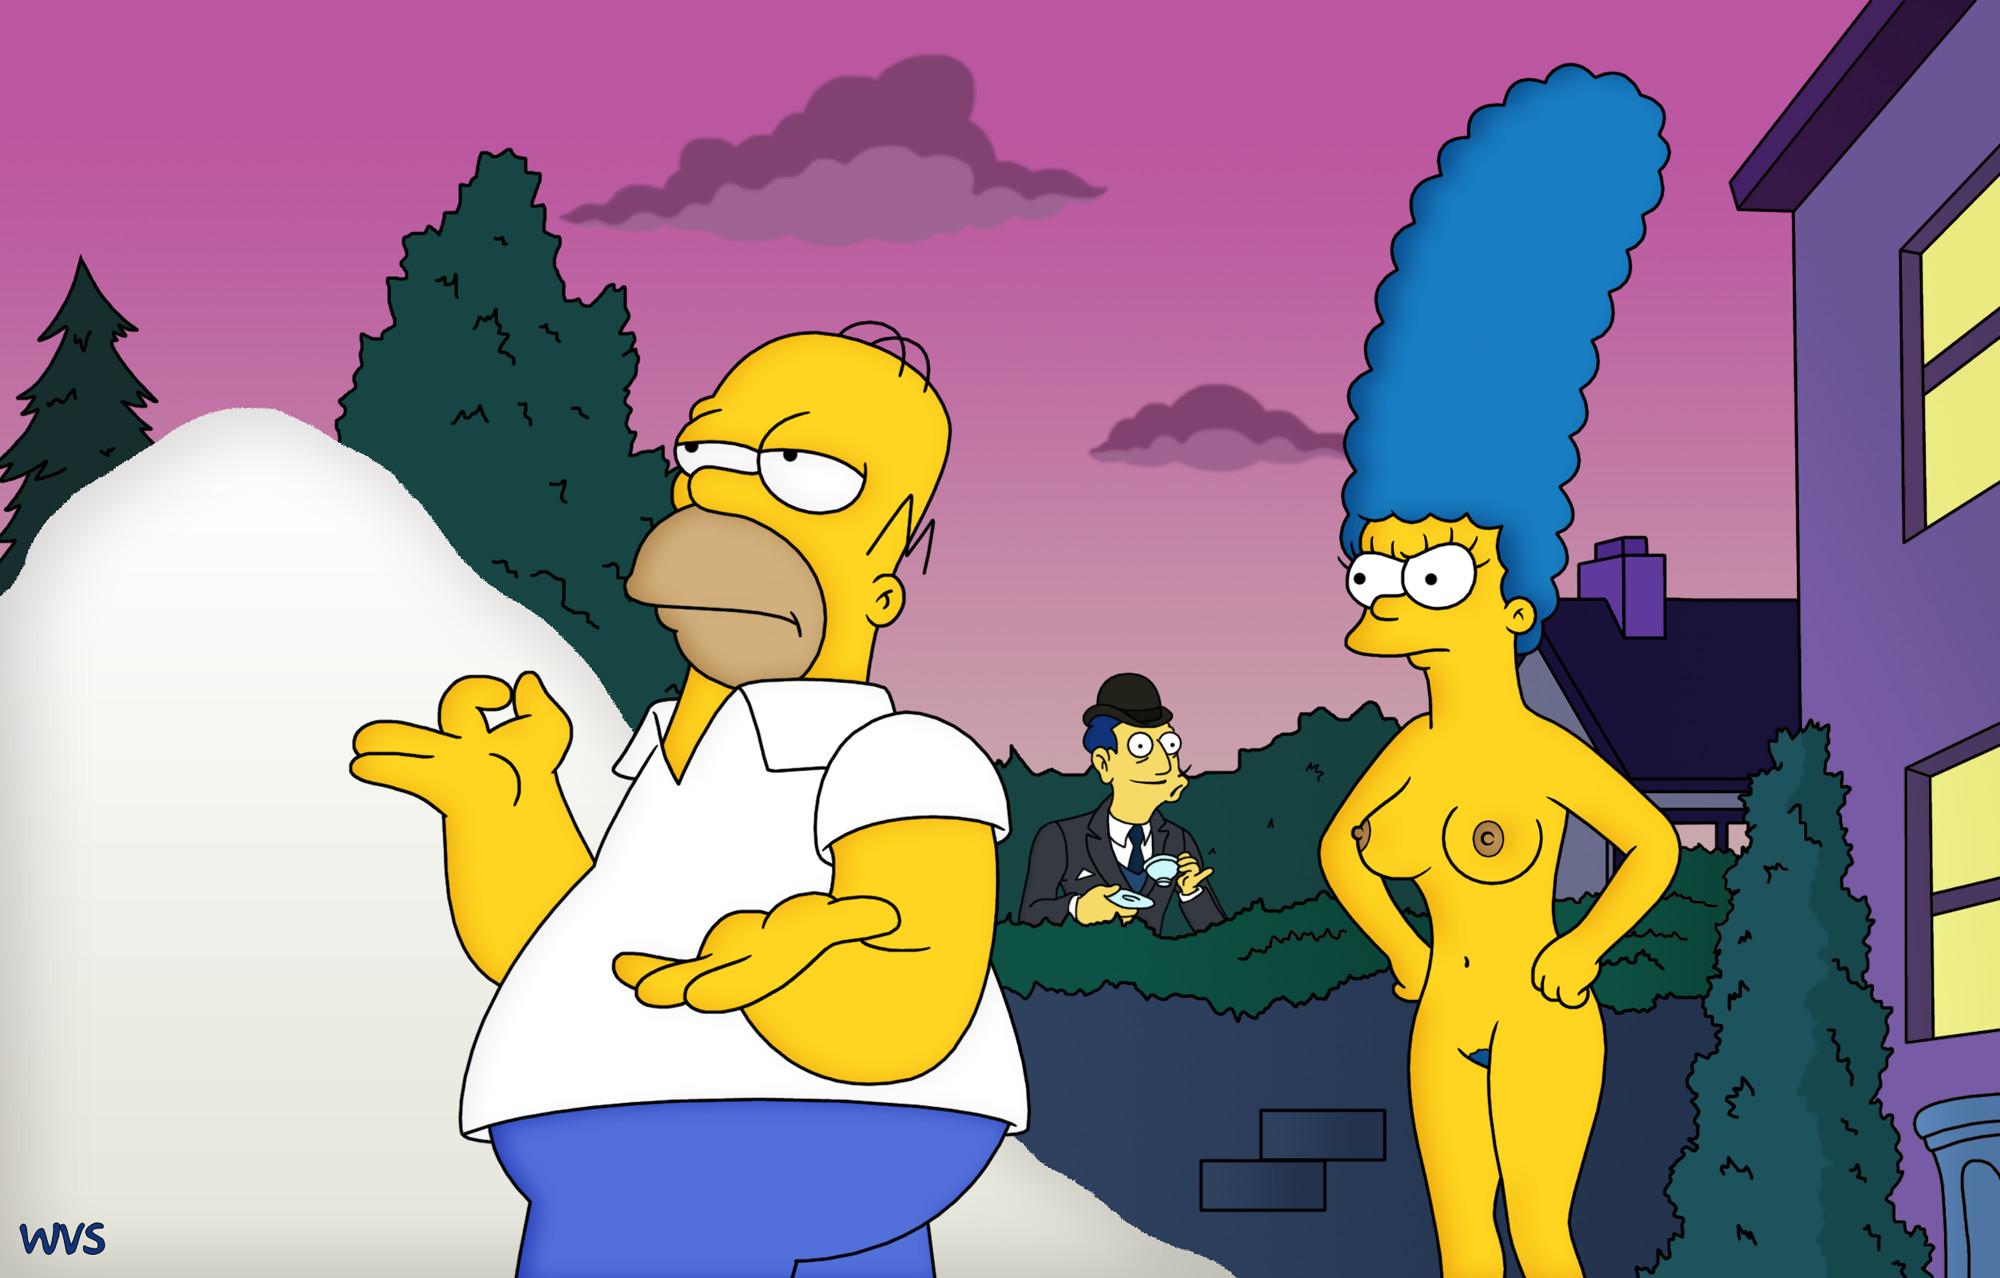 seks-mardzh-i-gomera-simpsona